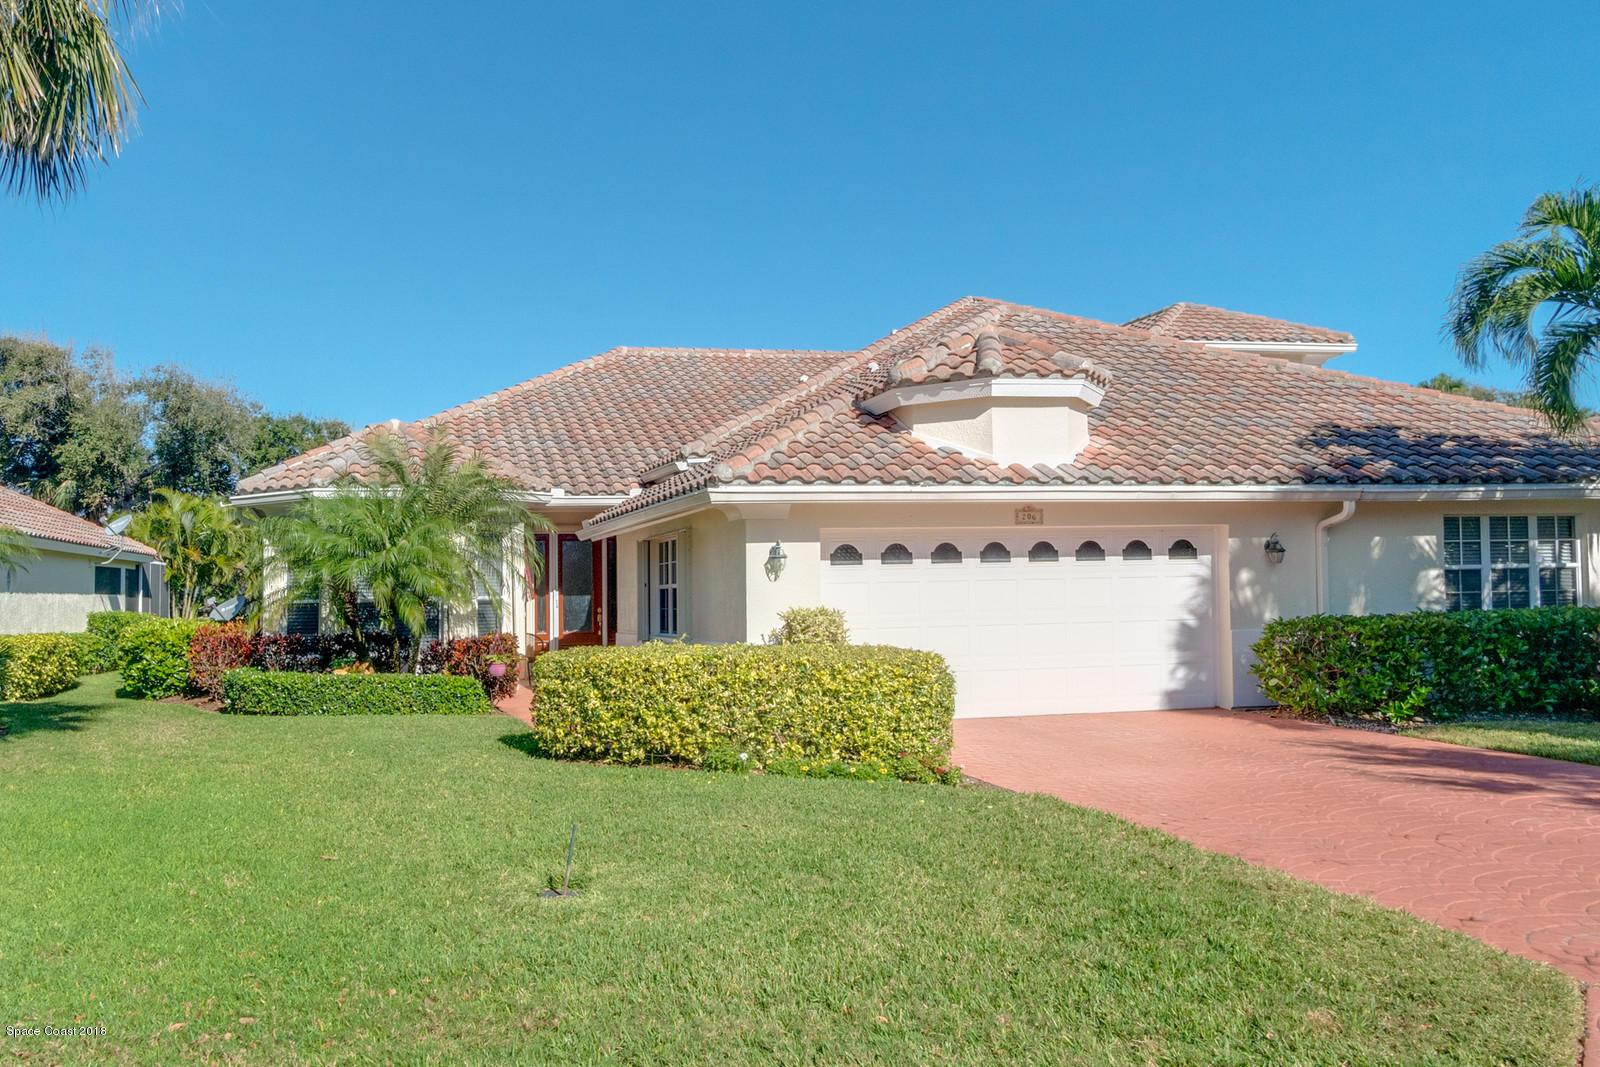 Property for Sale at 206 Osprey Villas 206 Osprey Villas Melbourne Beach, Florida 32951 United States